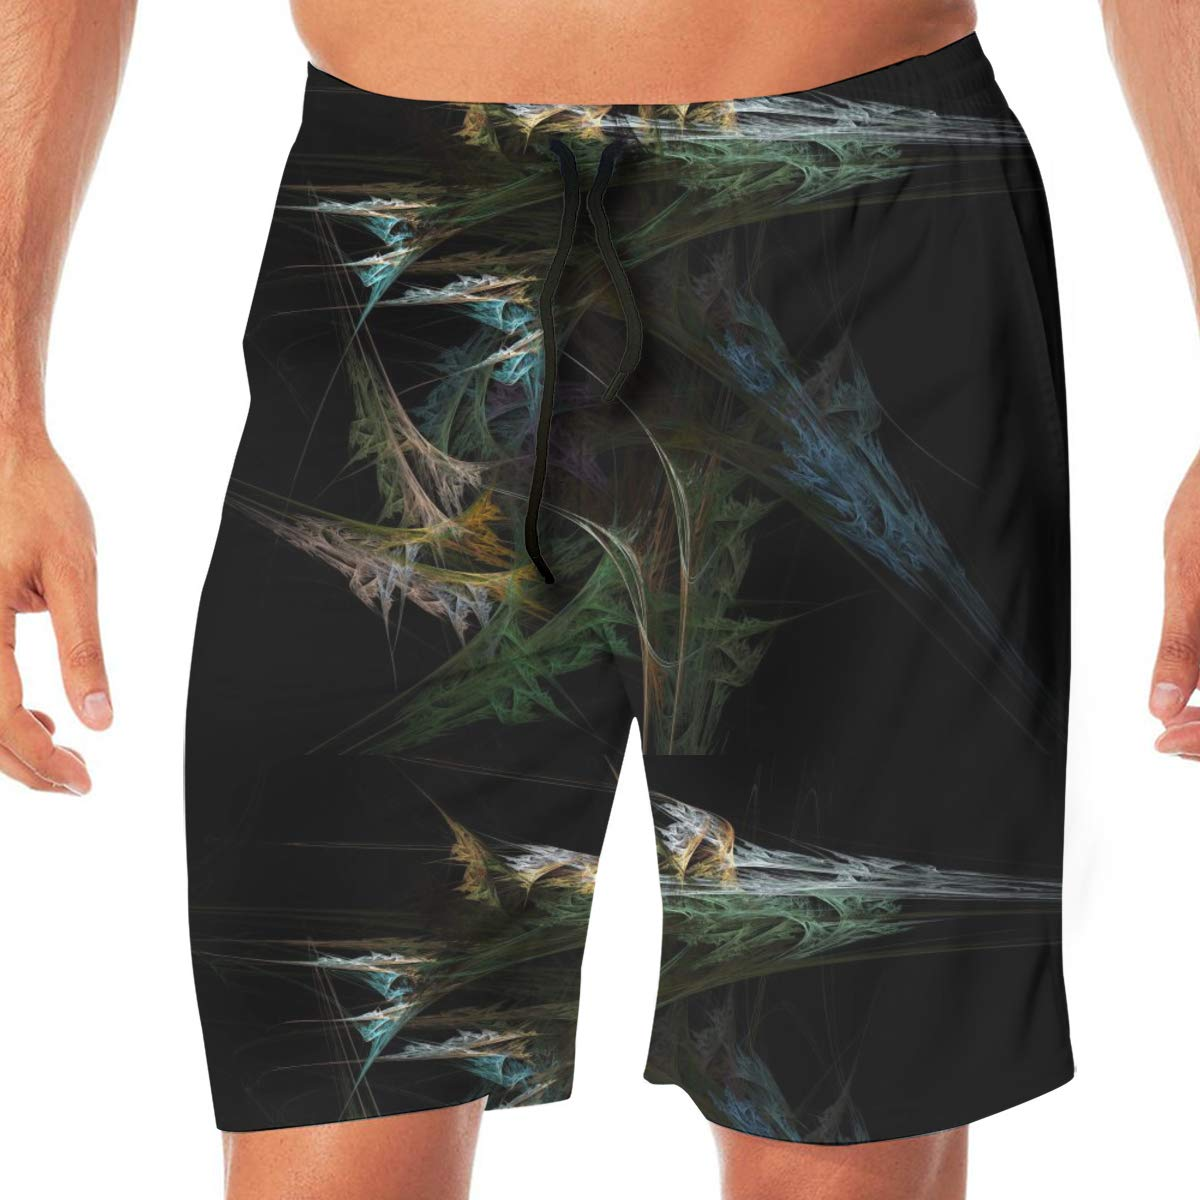 L XXL XL Cbyan Beach Trunks Mens Quick Dry Sports Shorts with Pockets M